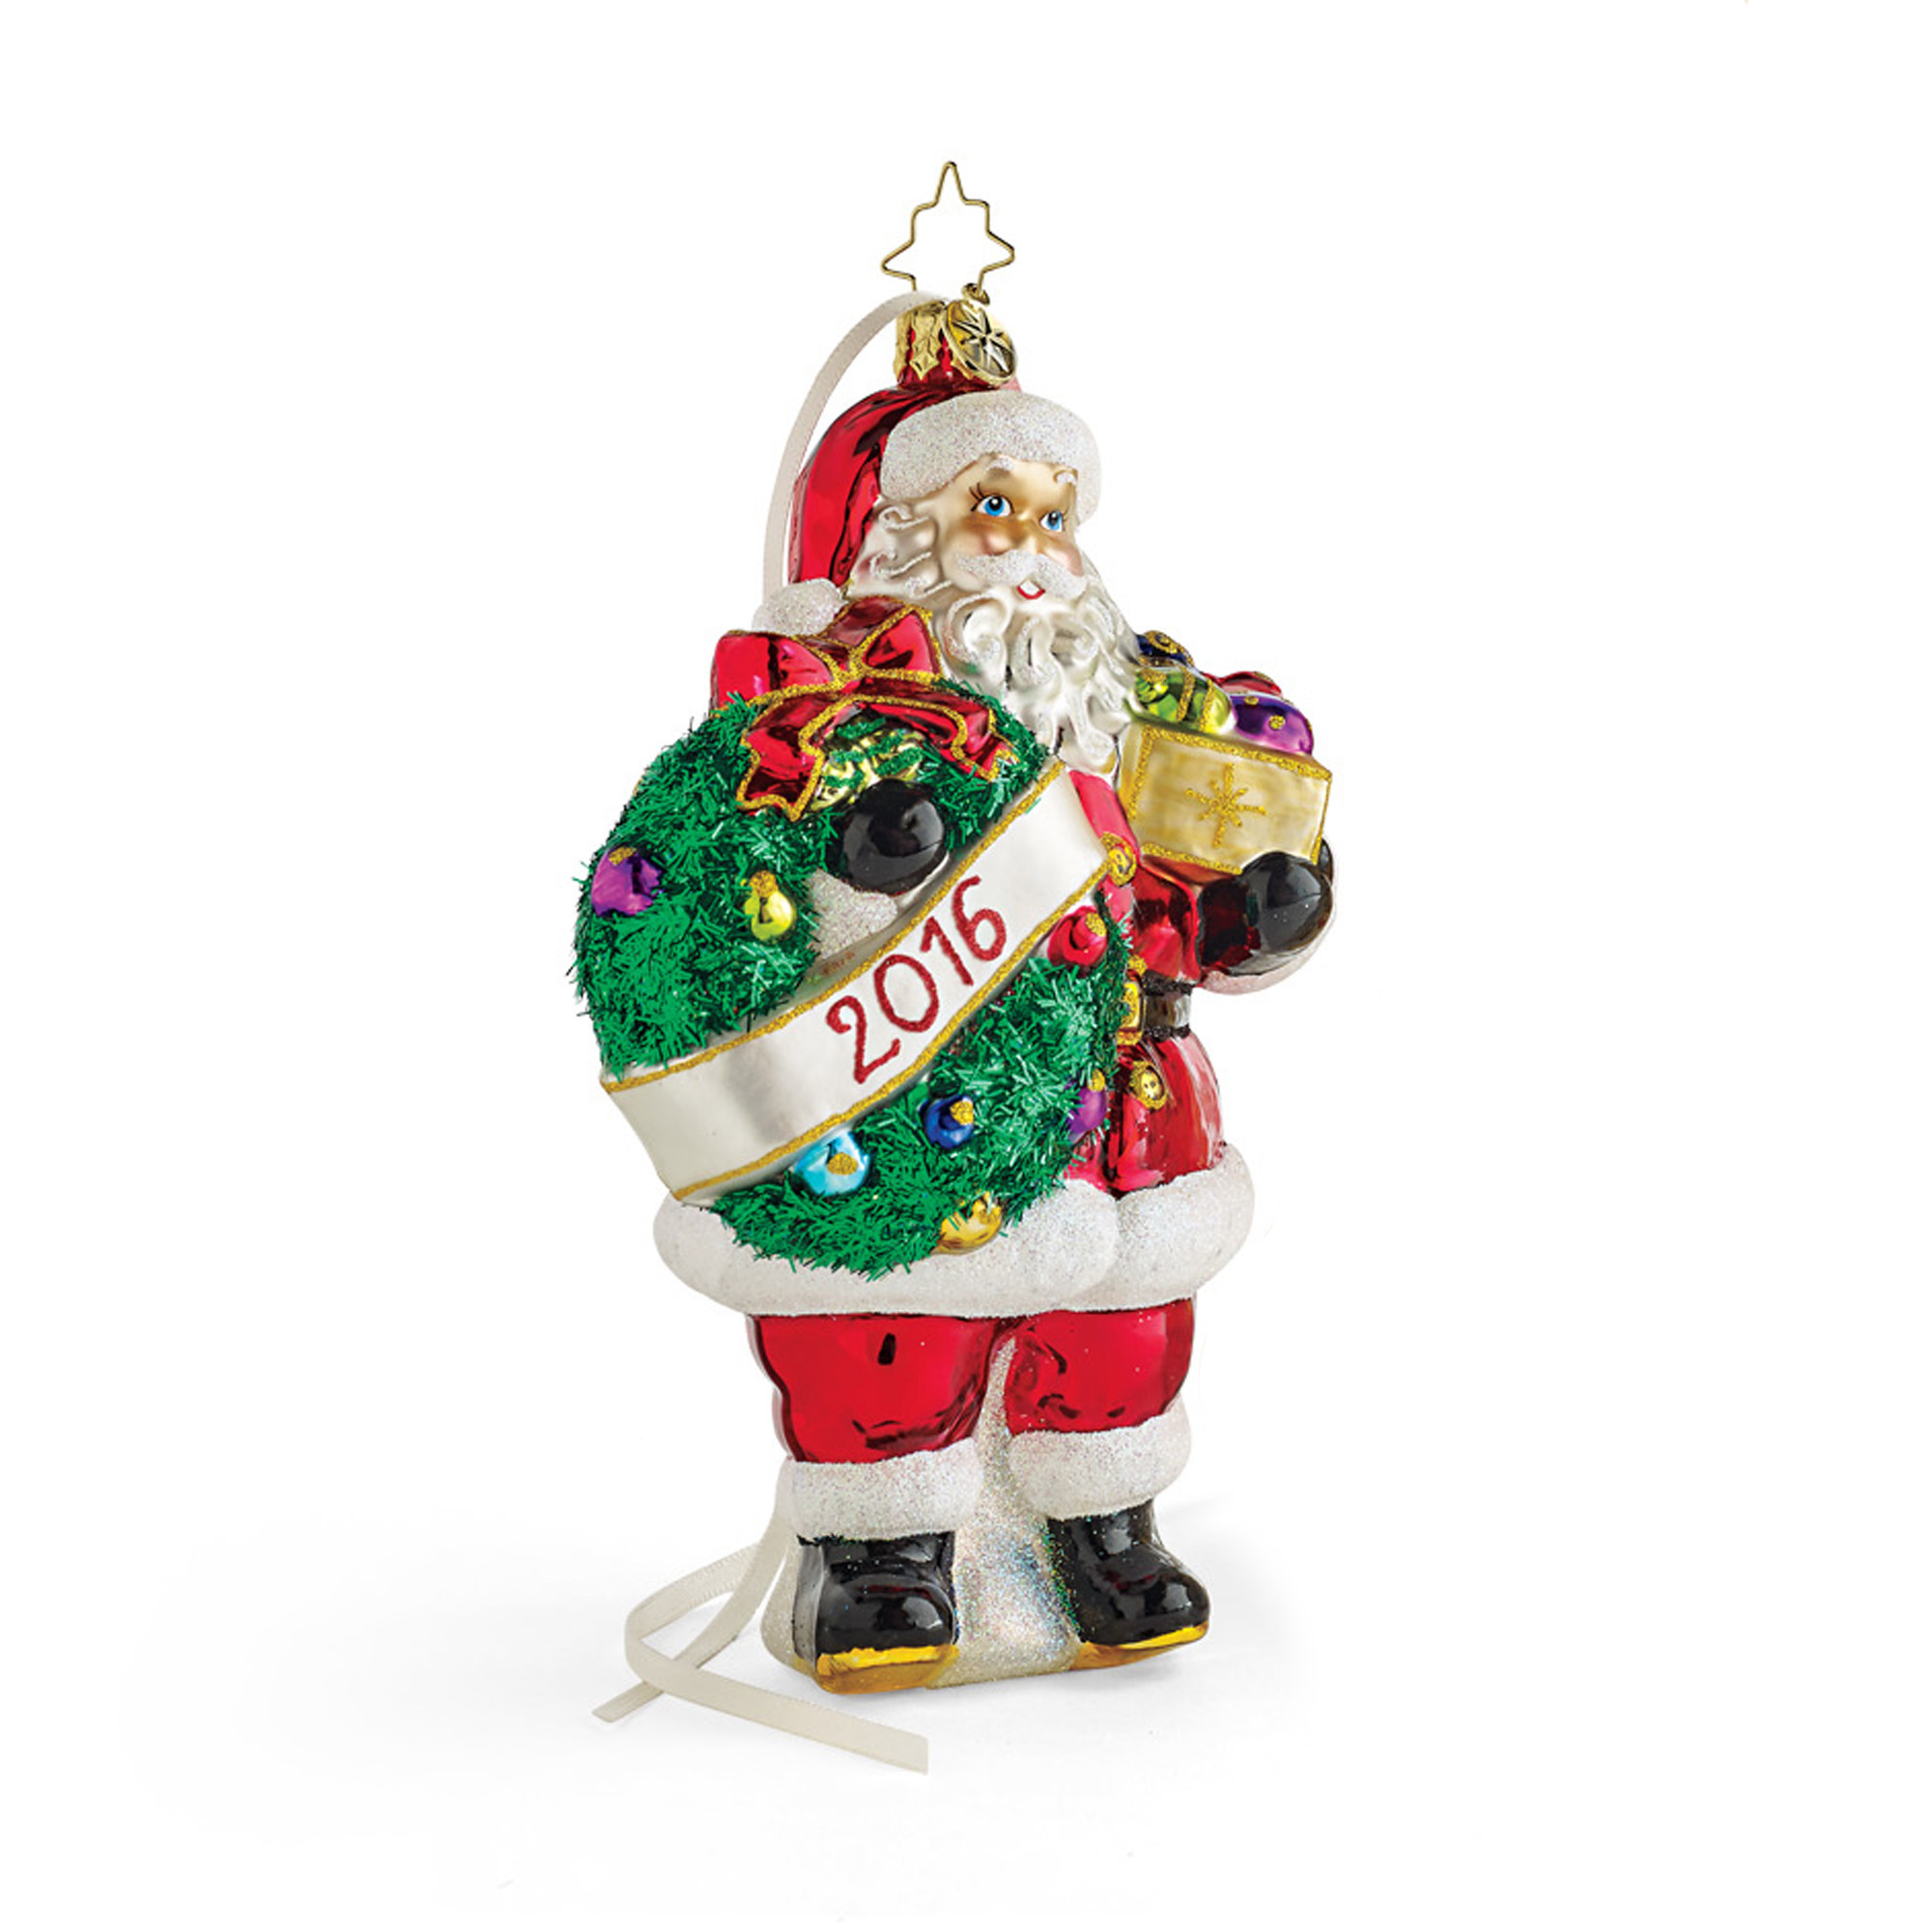 Christopher Radko Holly Jolly Year 2016 Annual Christmas Ornament ...